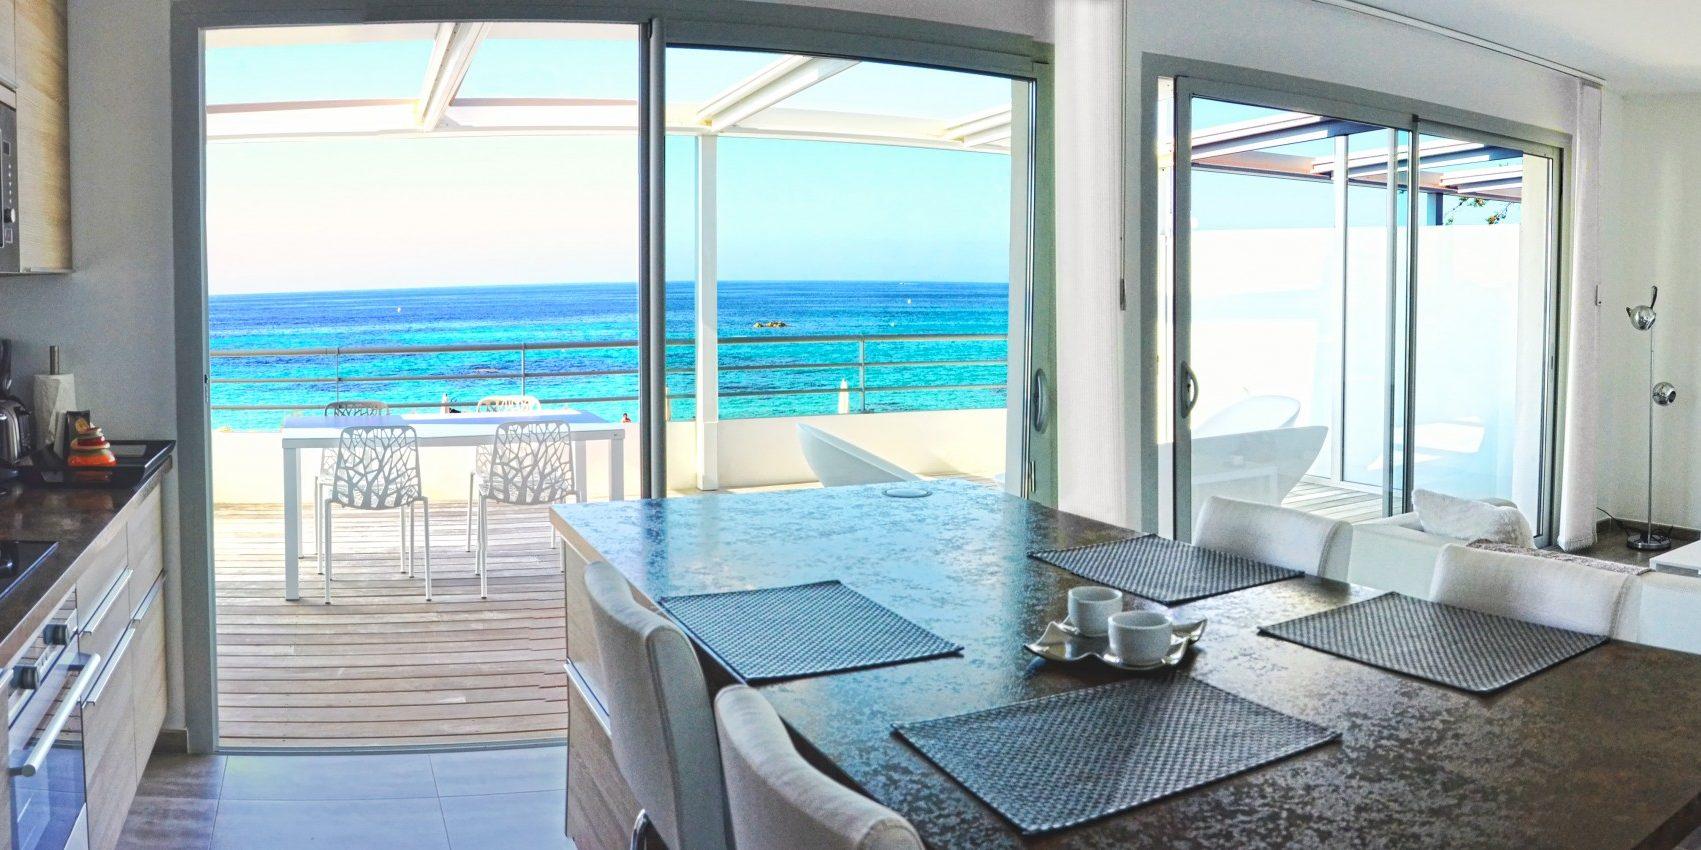 Residence Dary Ile Rousse Balagne Corsica Frankrijk keuken eethoek zithoek living balkon terras zeezicht